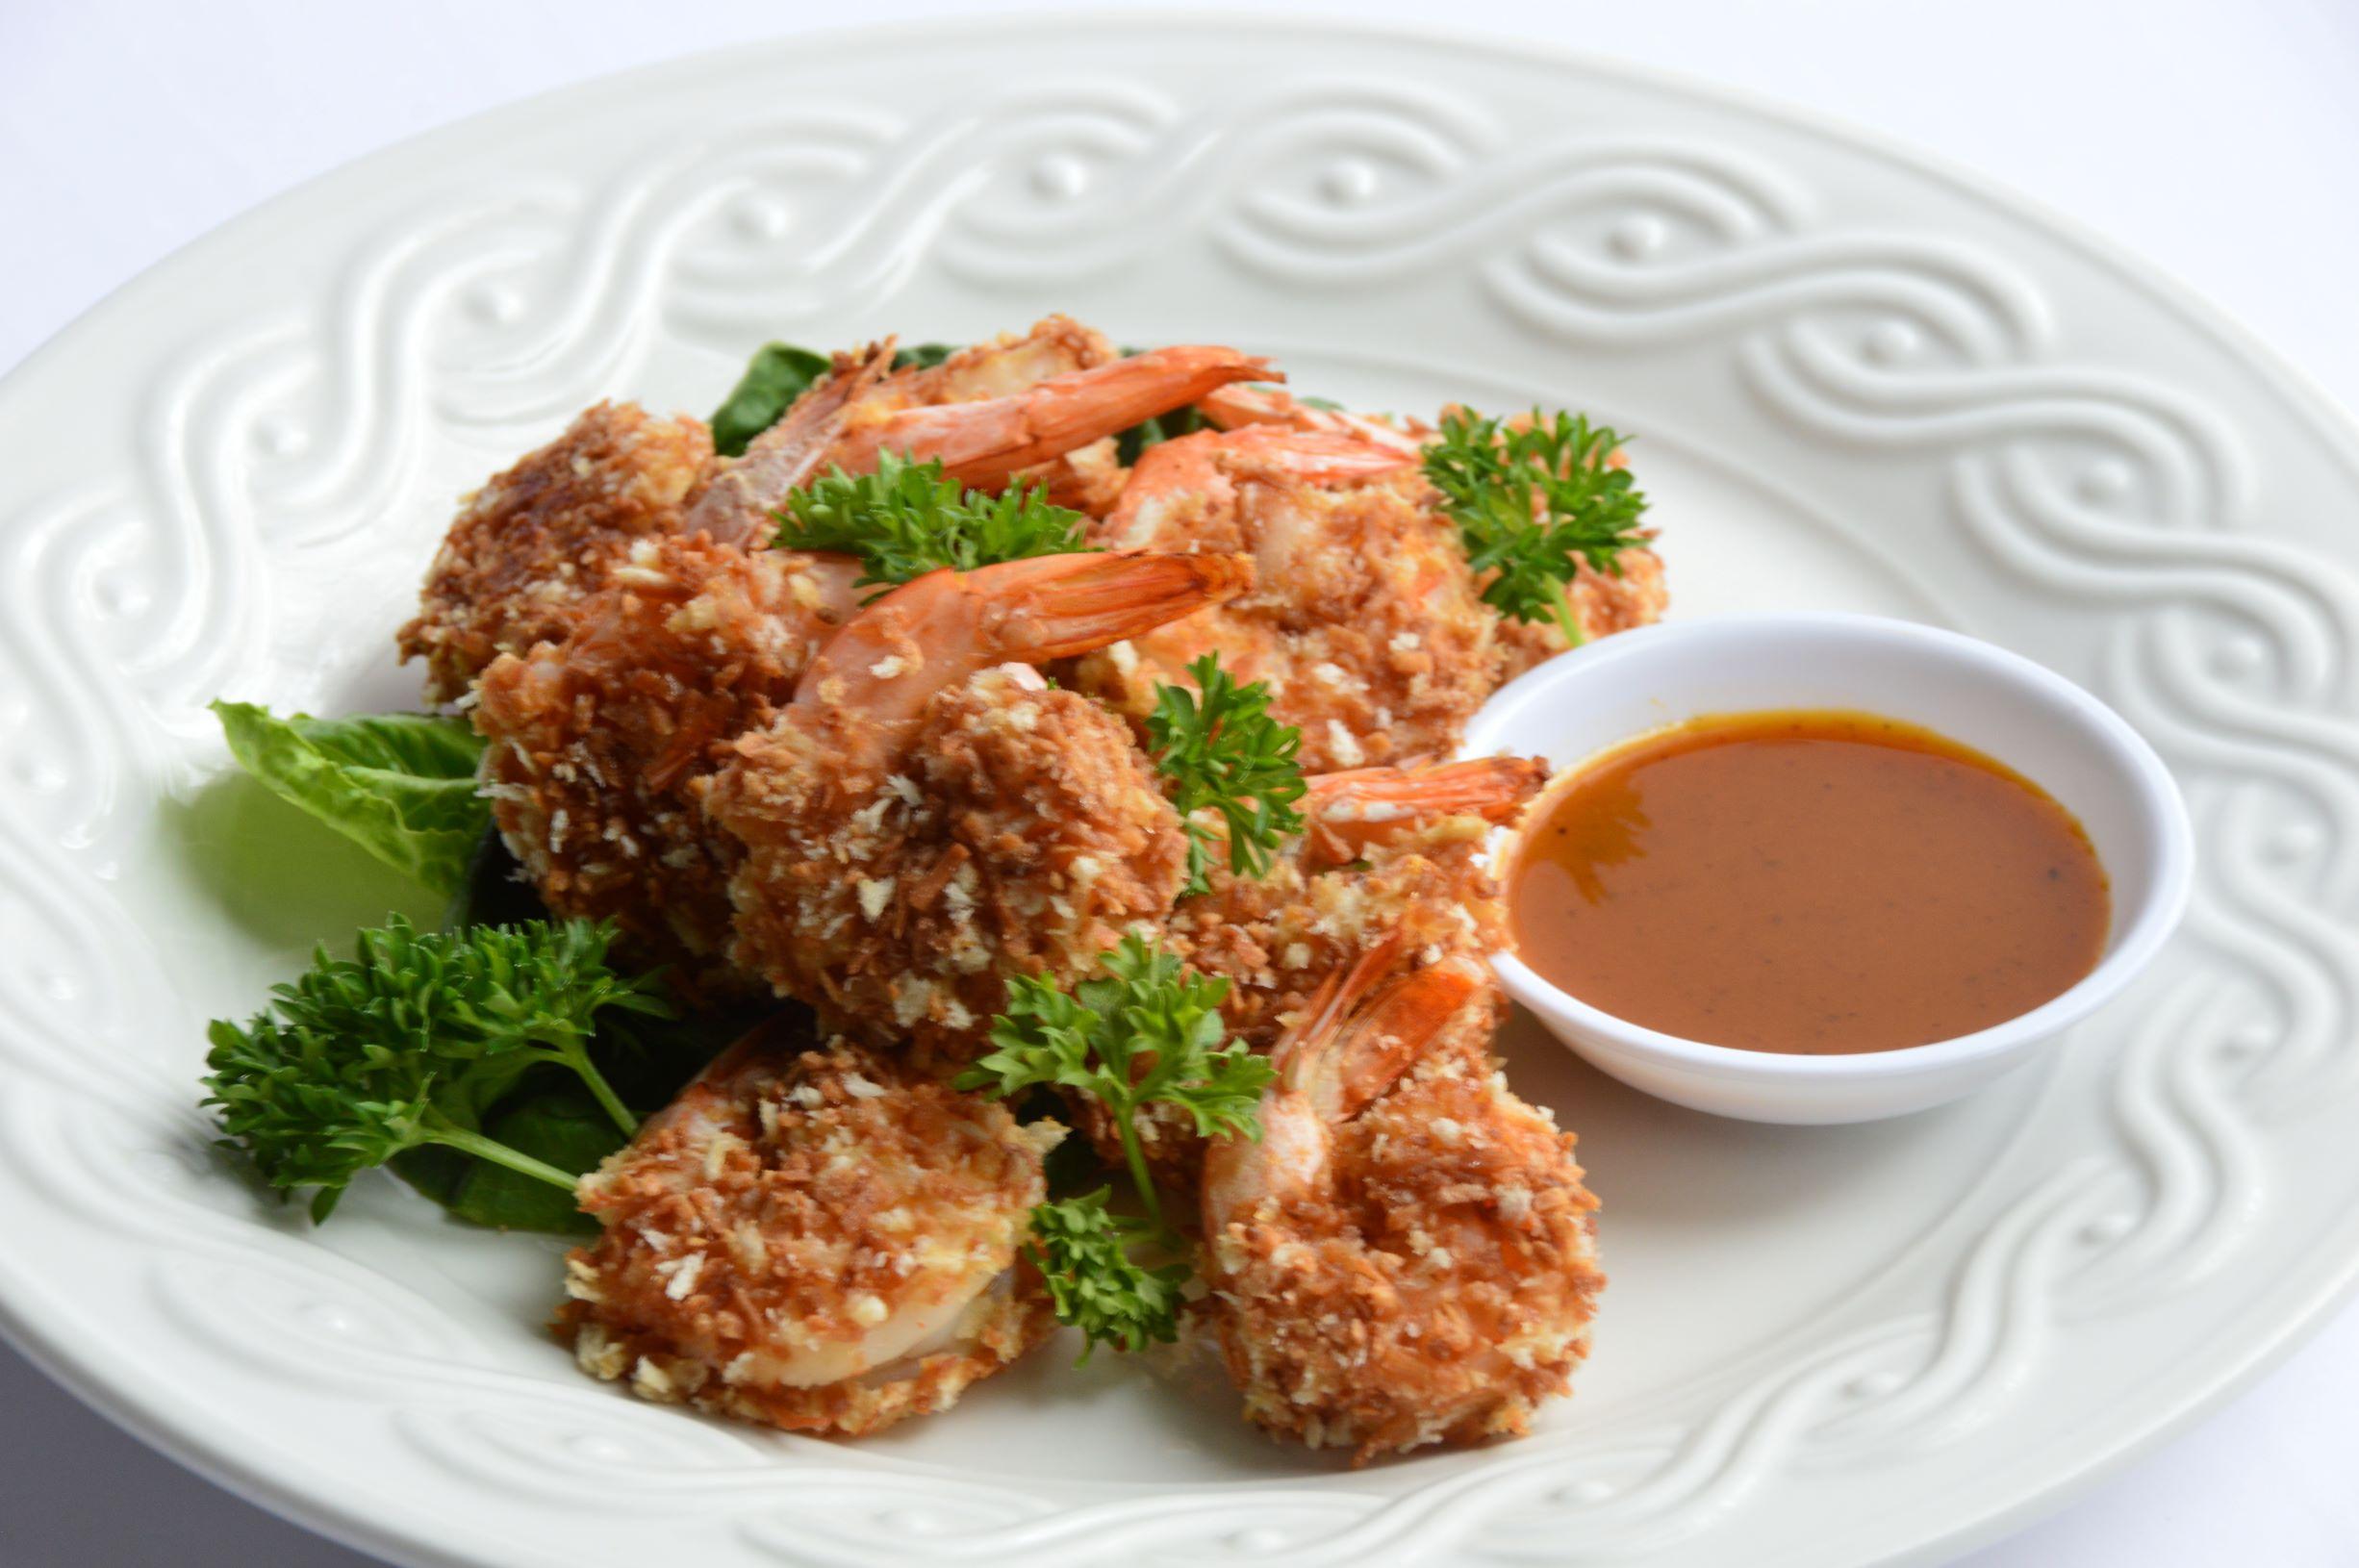 Coconut Shrimp & Sweet Mustard Dipping Sauce